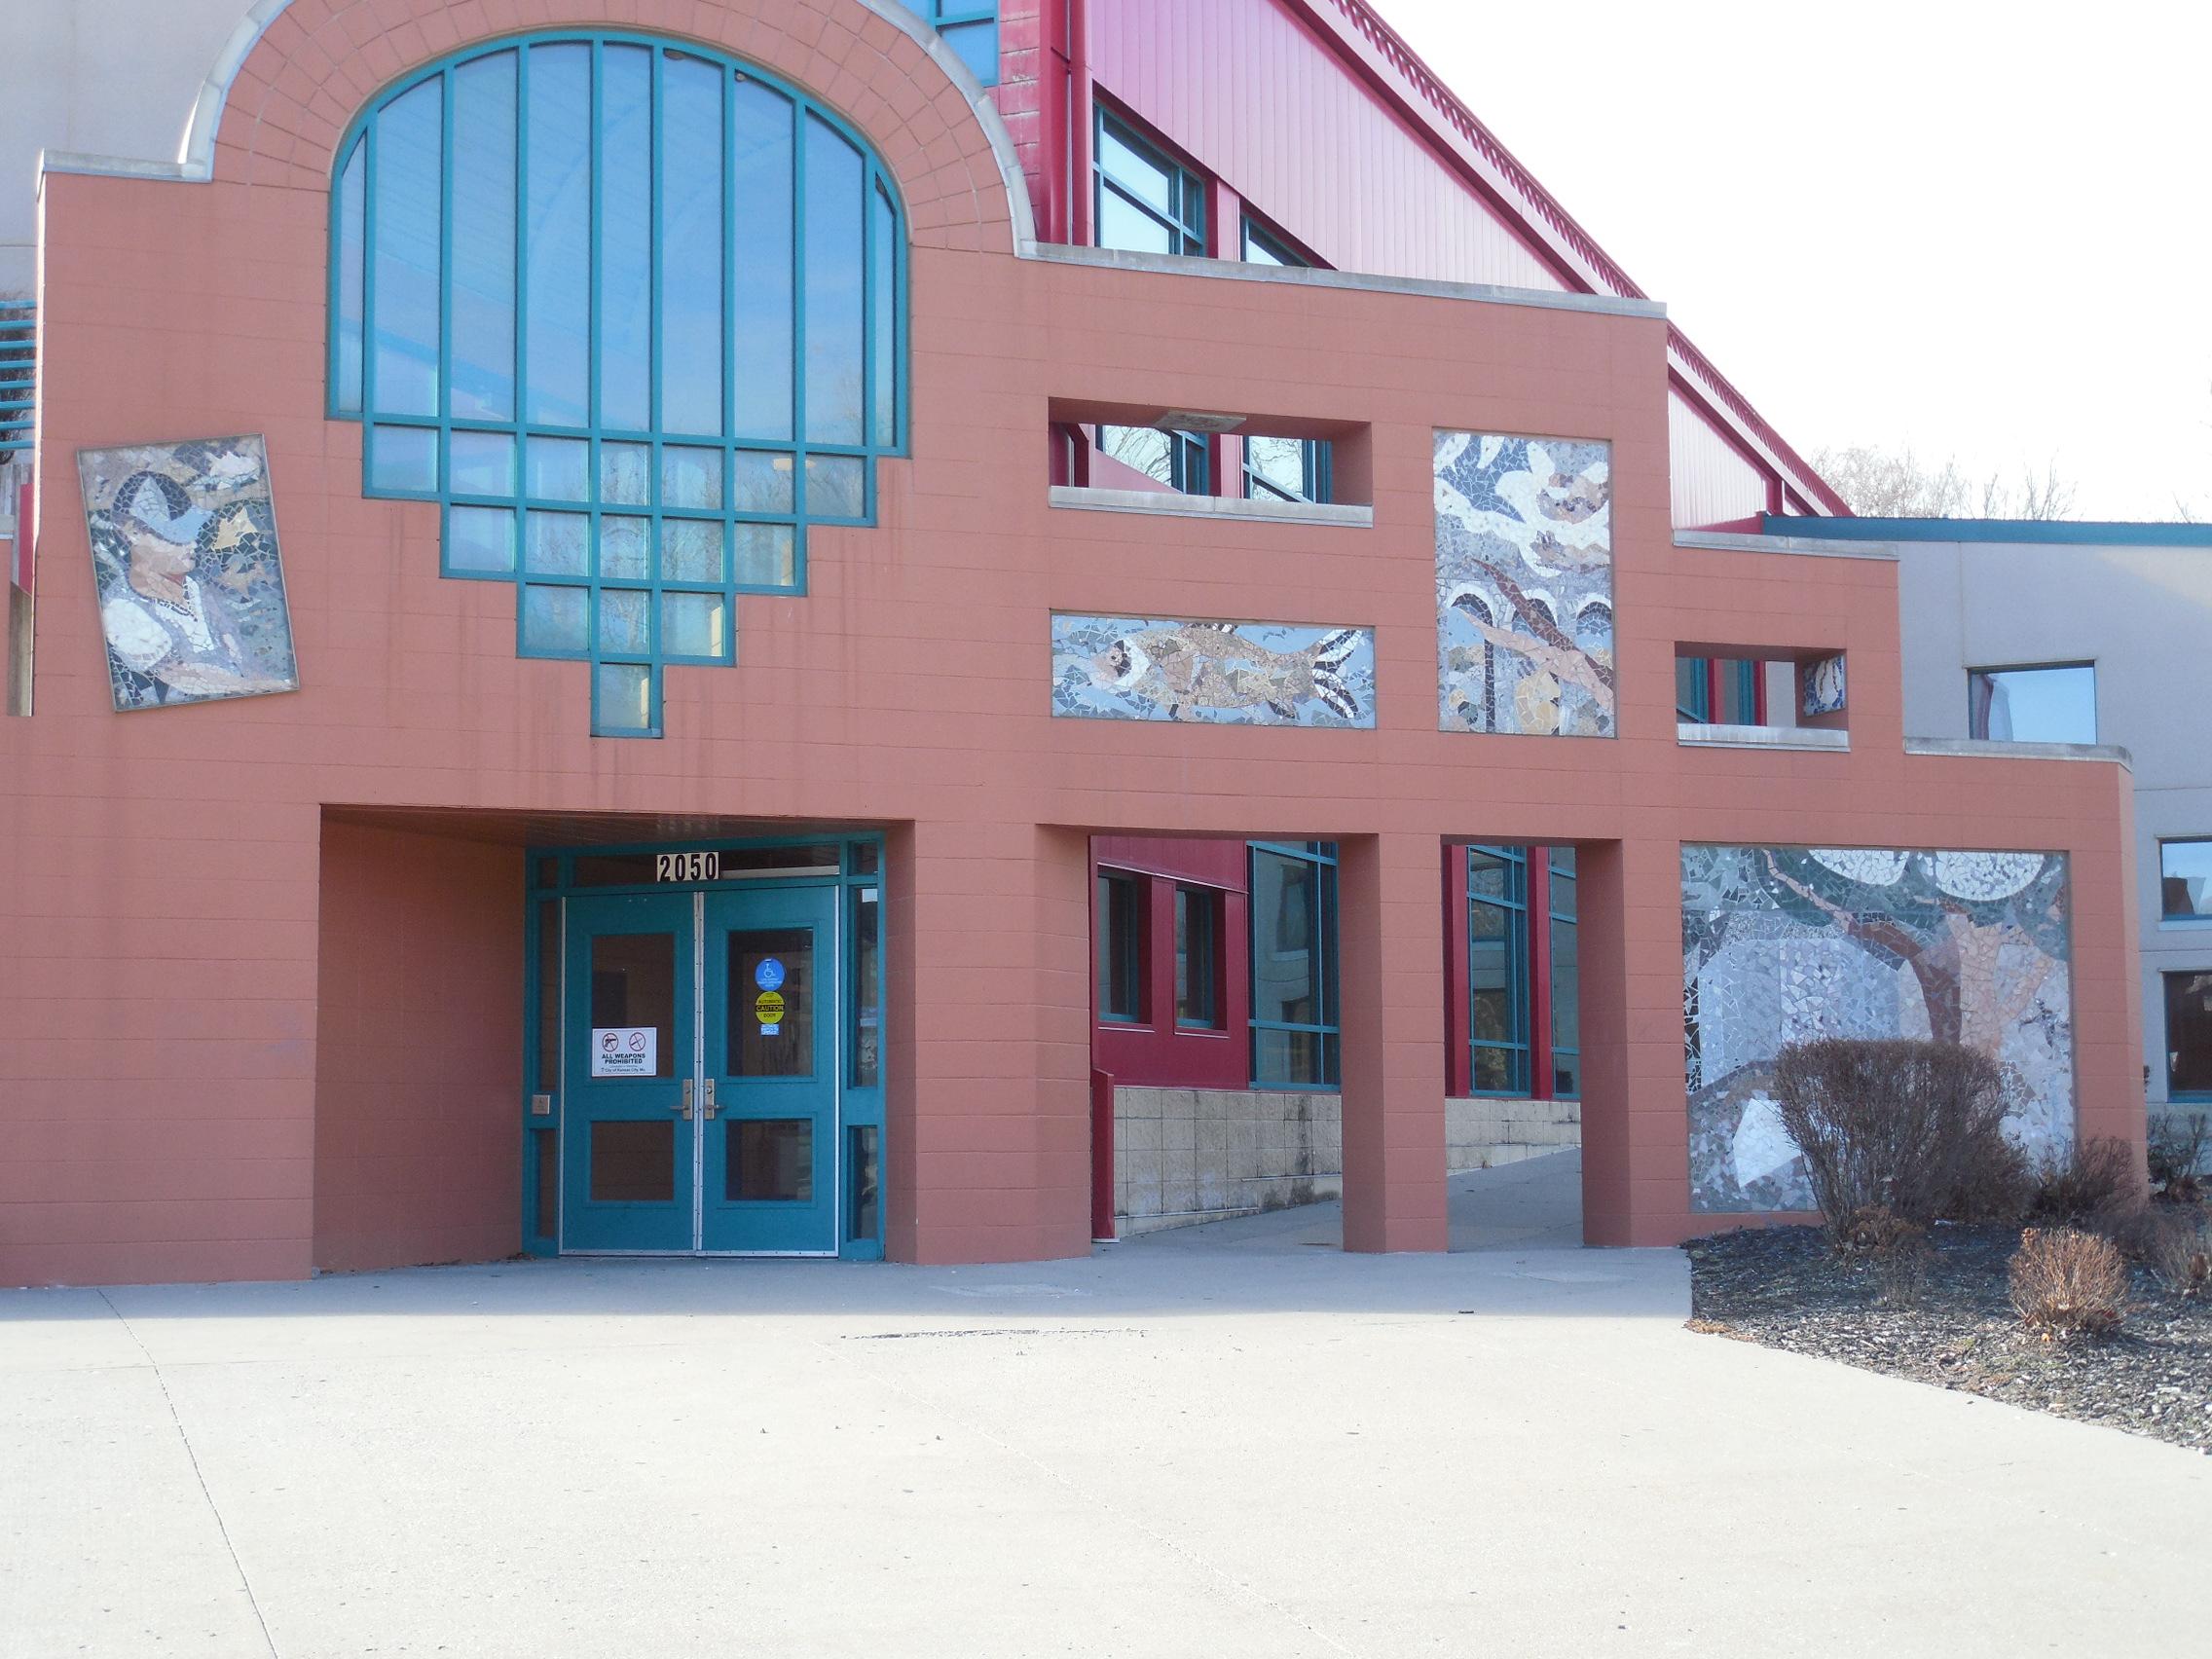 Food Bank Hours Kalispell